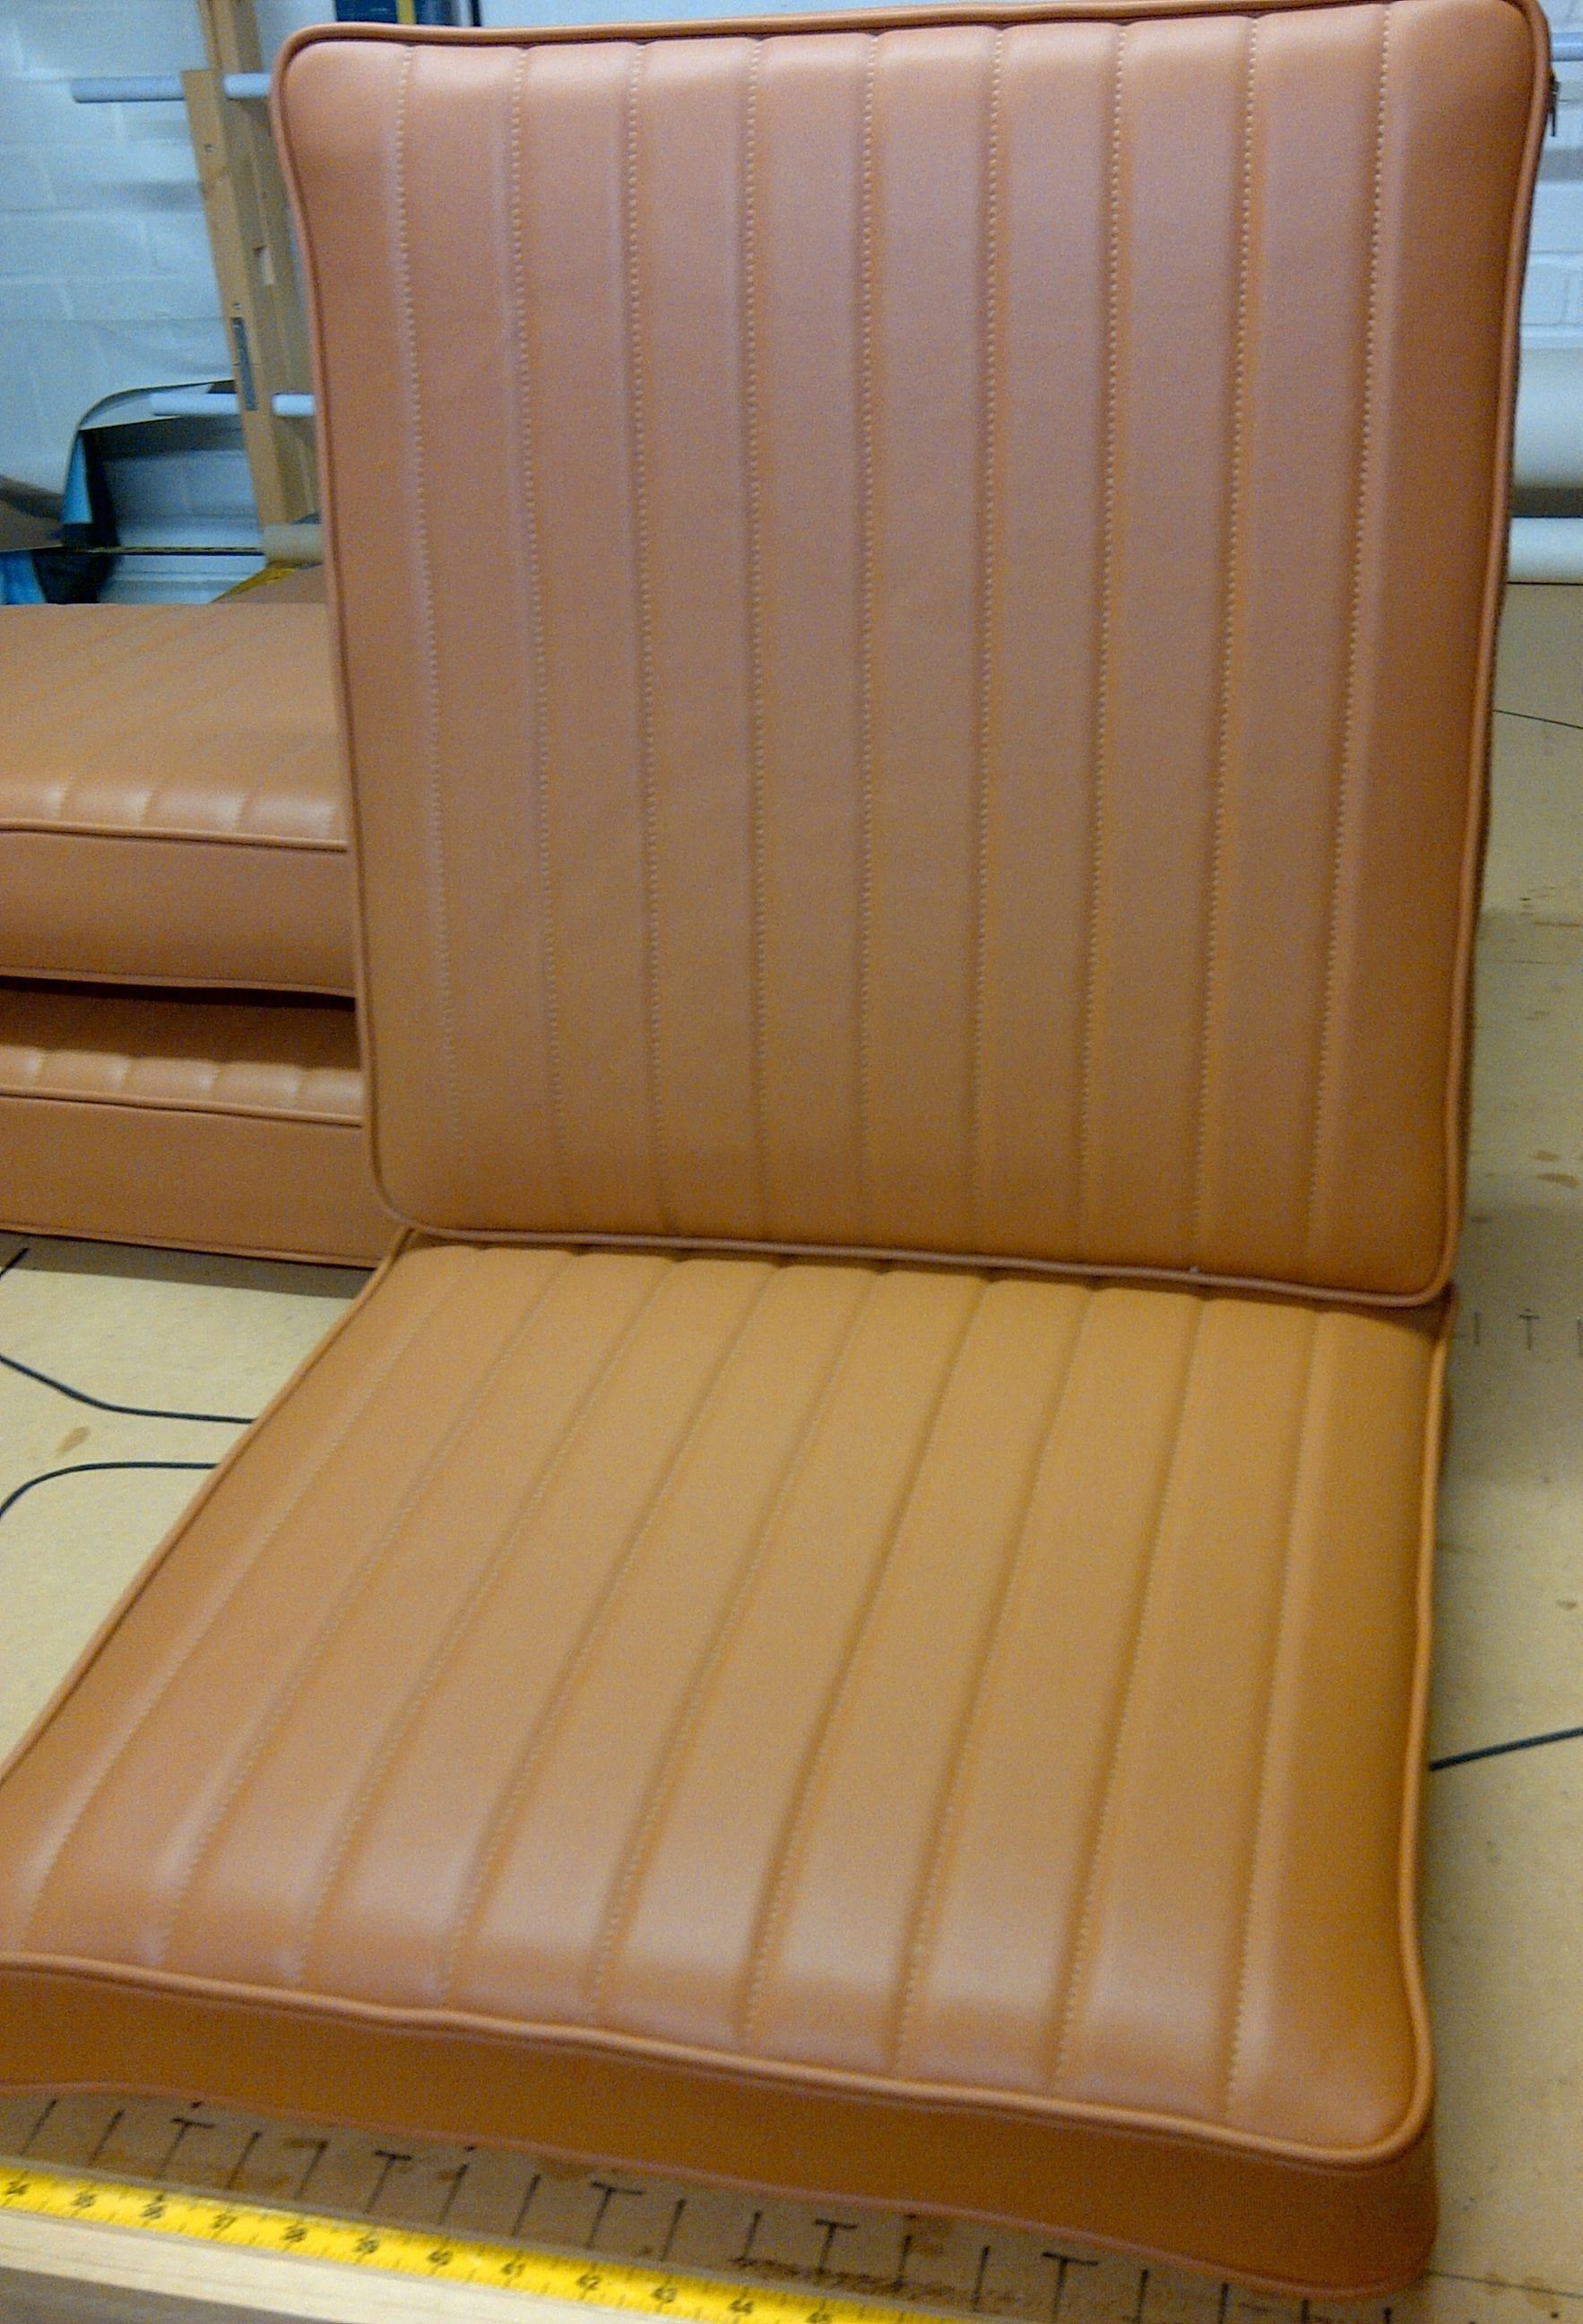 Vw Buddy Seat Delilah S Vw Camper Furnishings